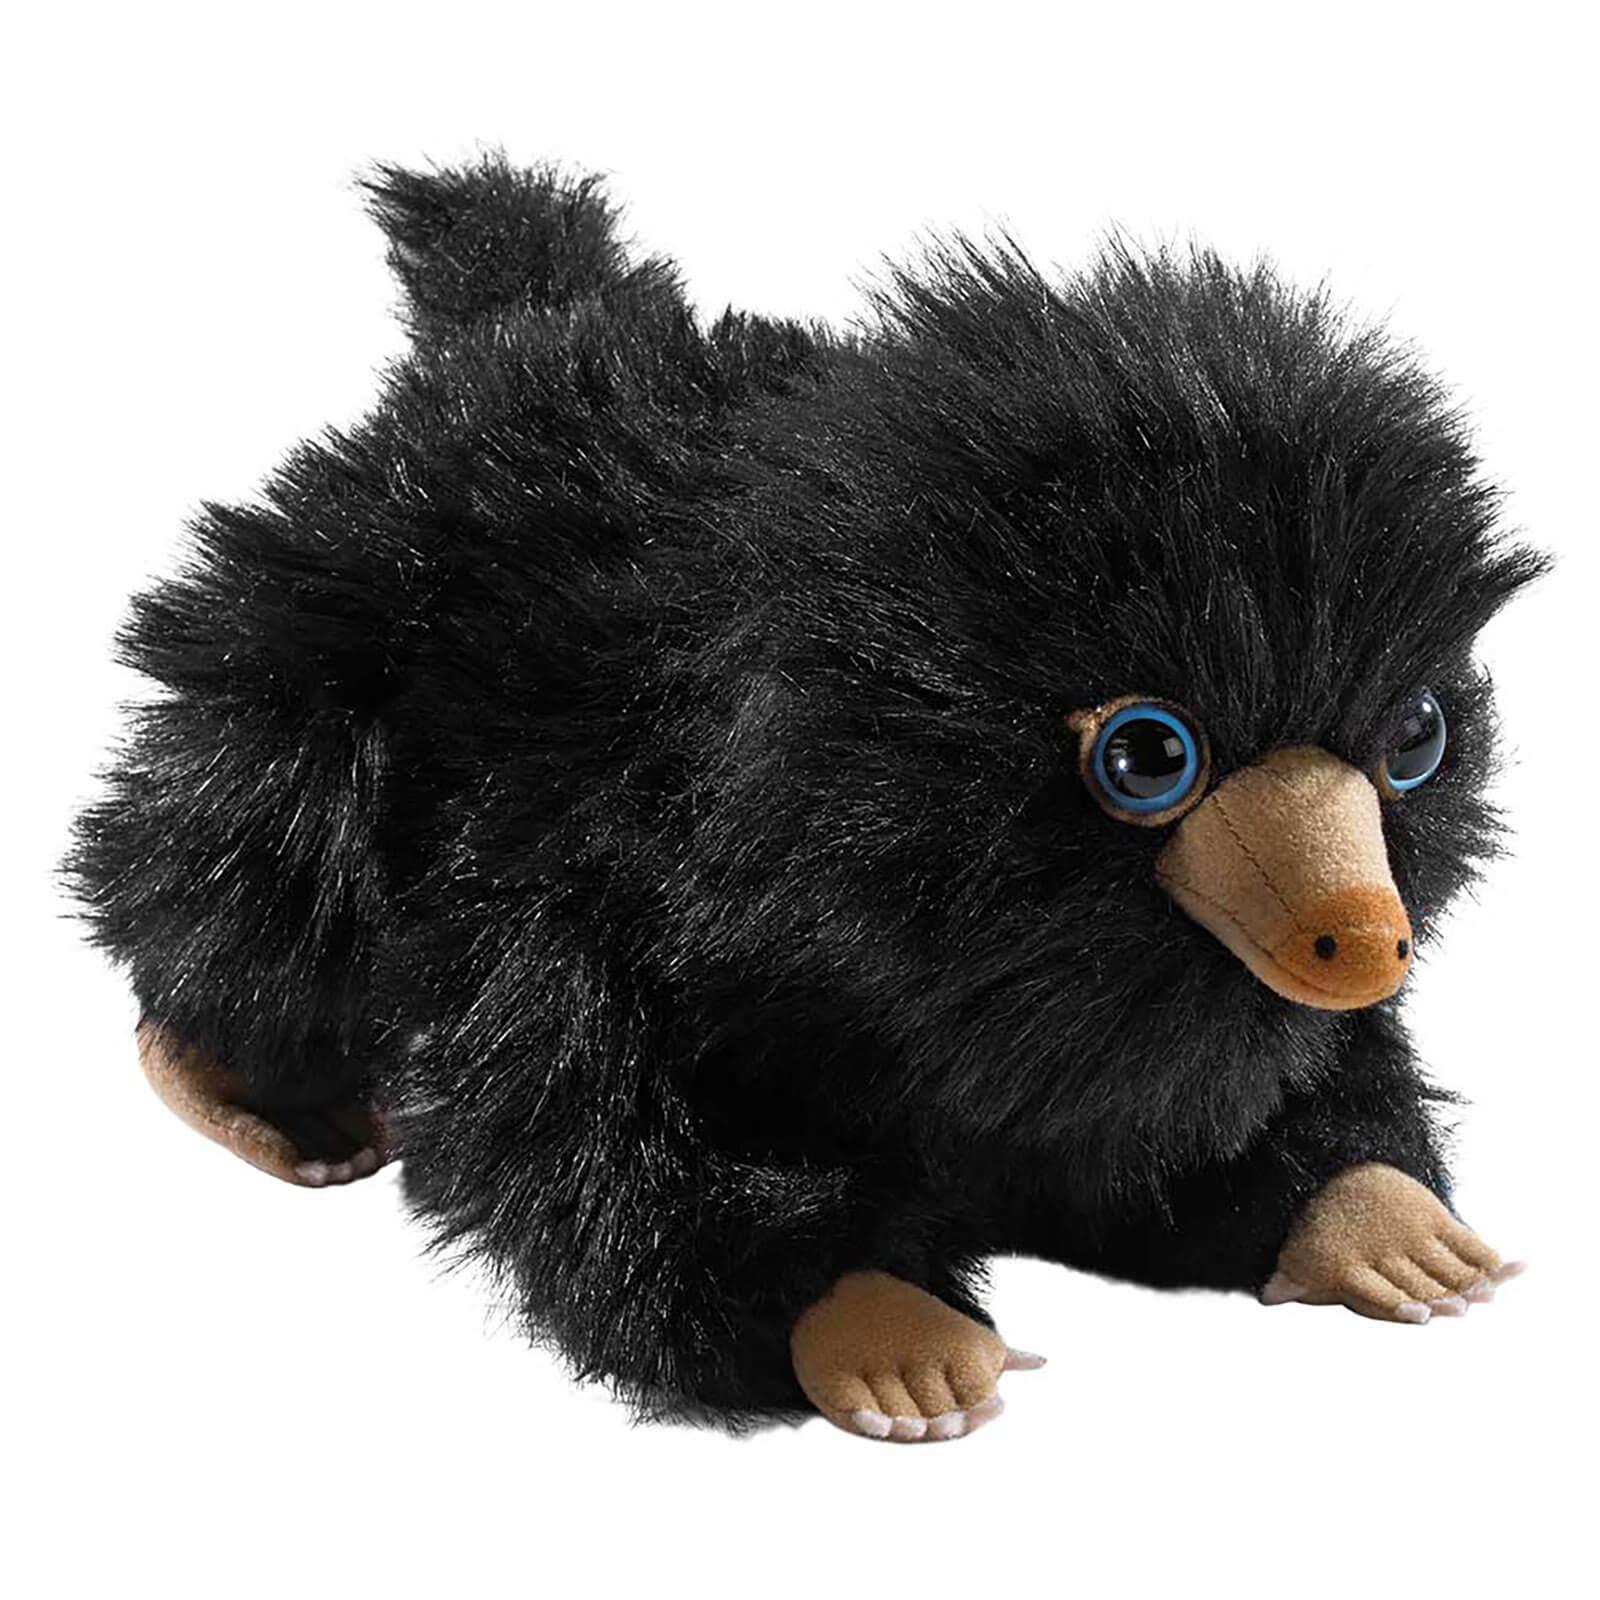 Image of Fantastic Beasts Baby Niffler Plush - Black